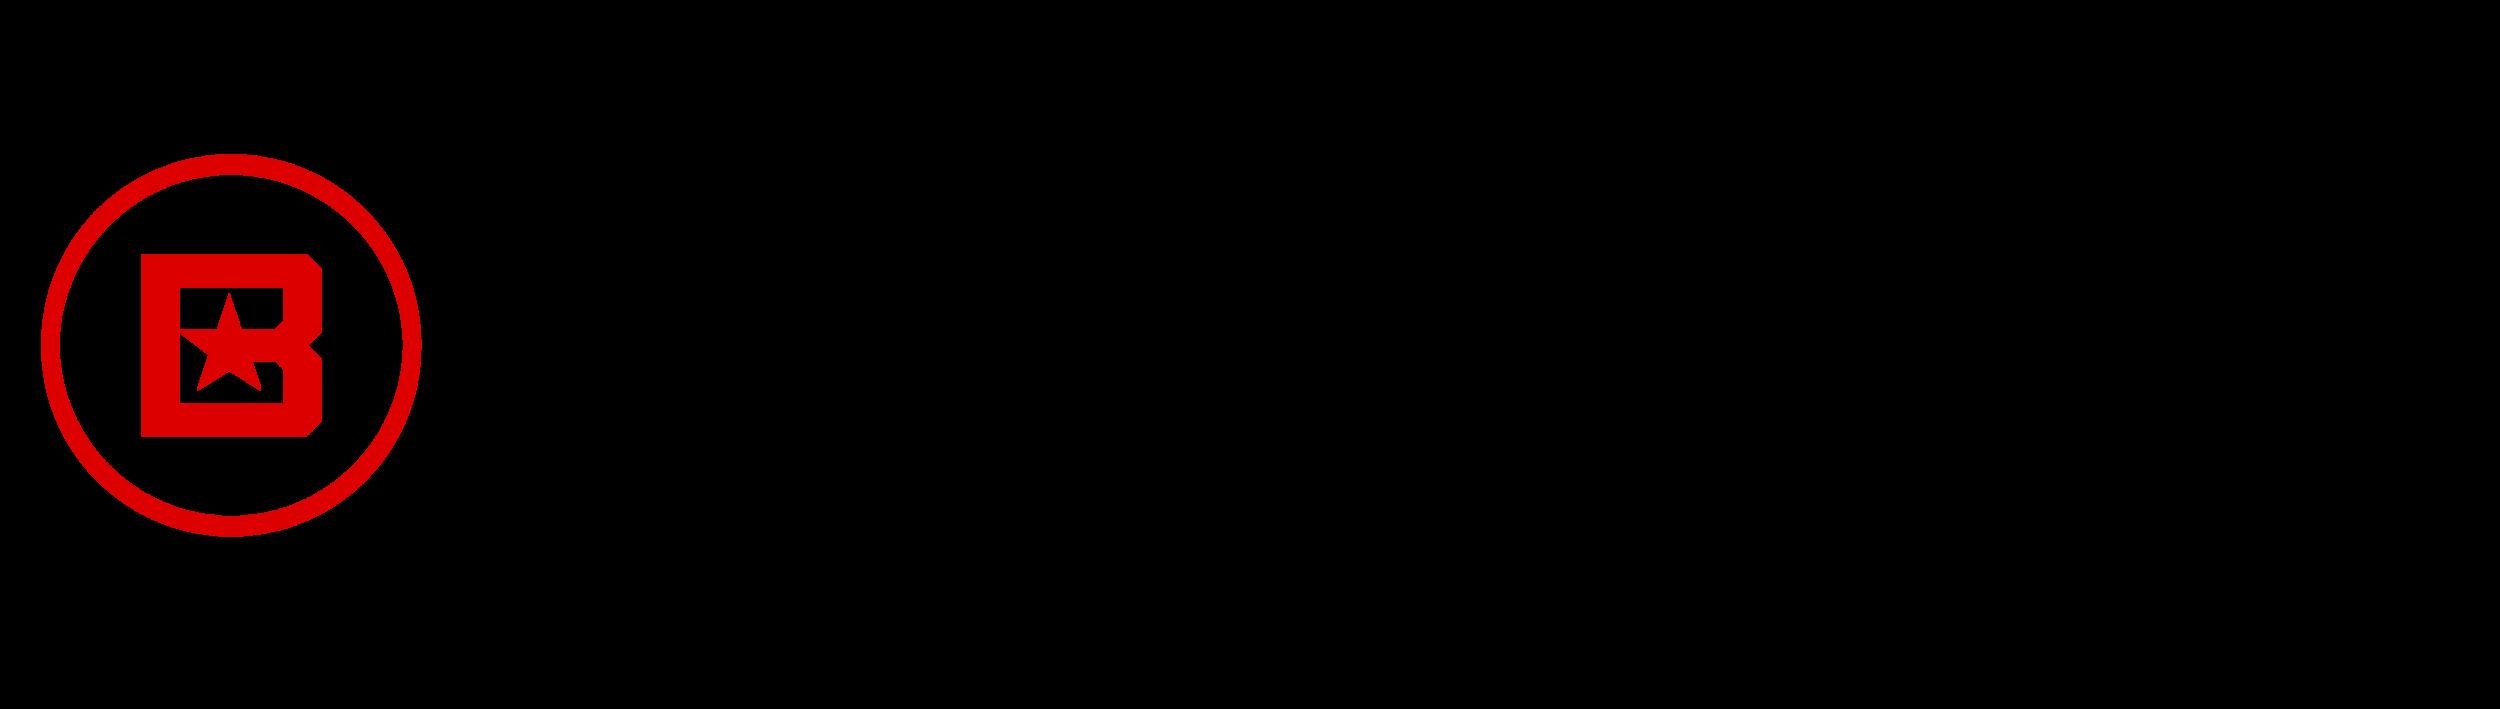 beatstars x raw file logo.png